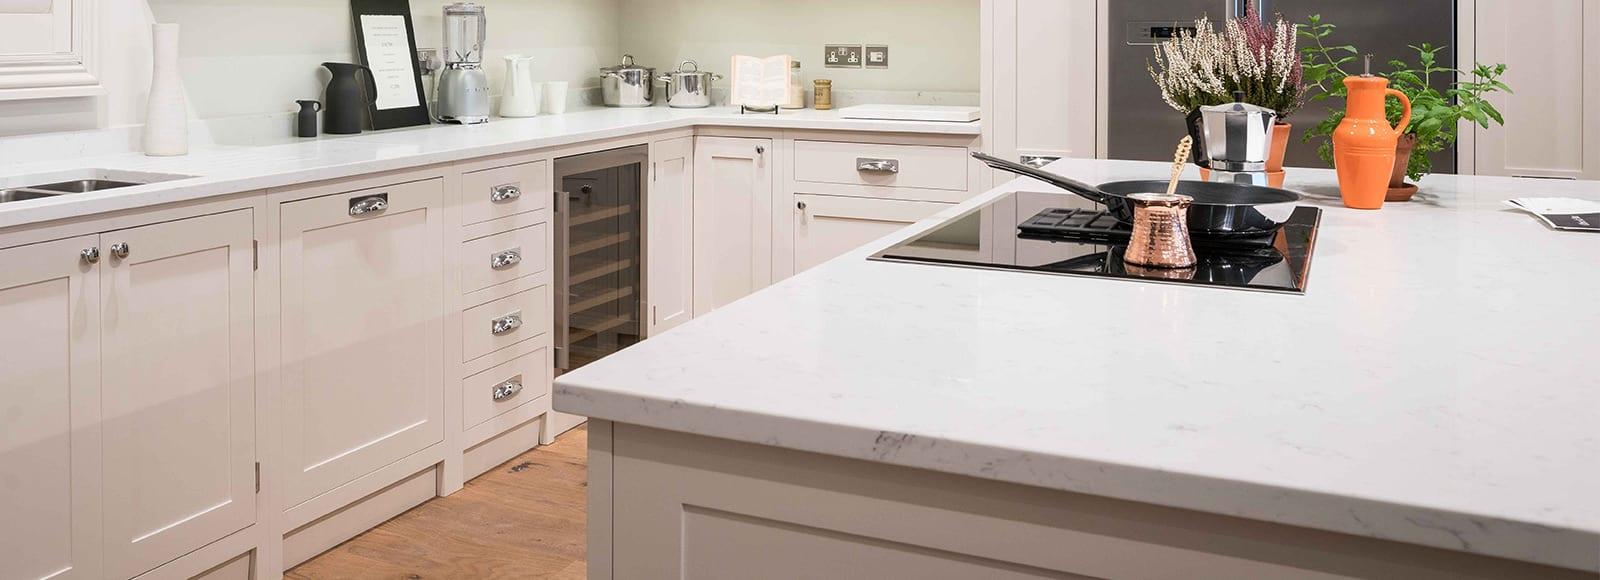 shaker kitchen stone work tops